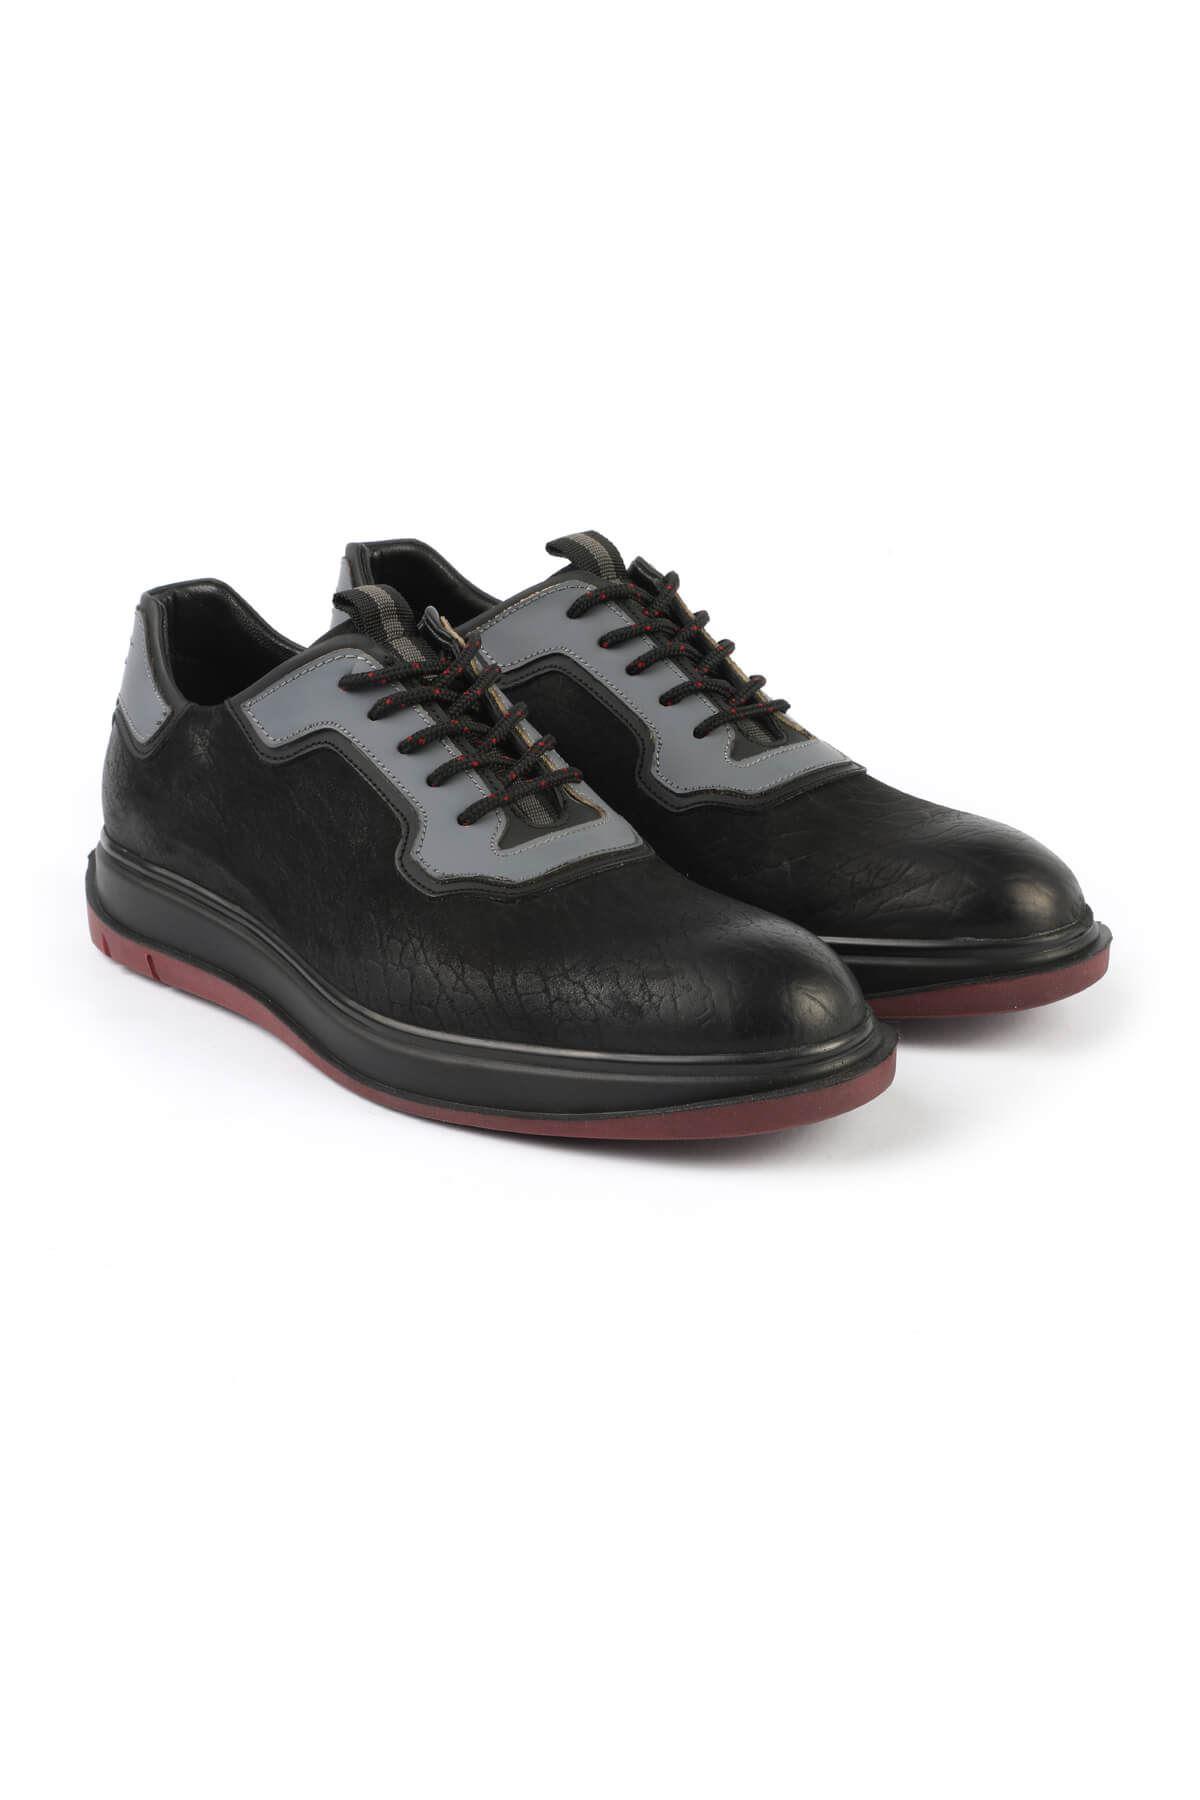 Libero 3172 Black Sports Shoes